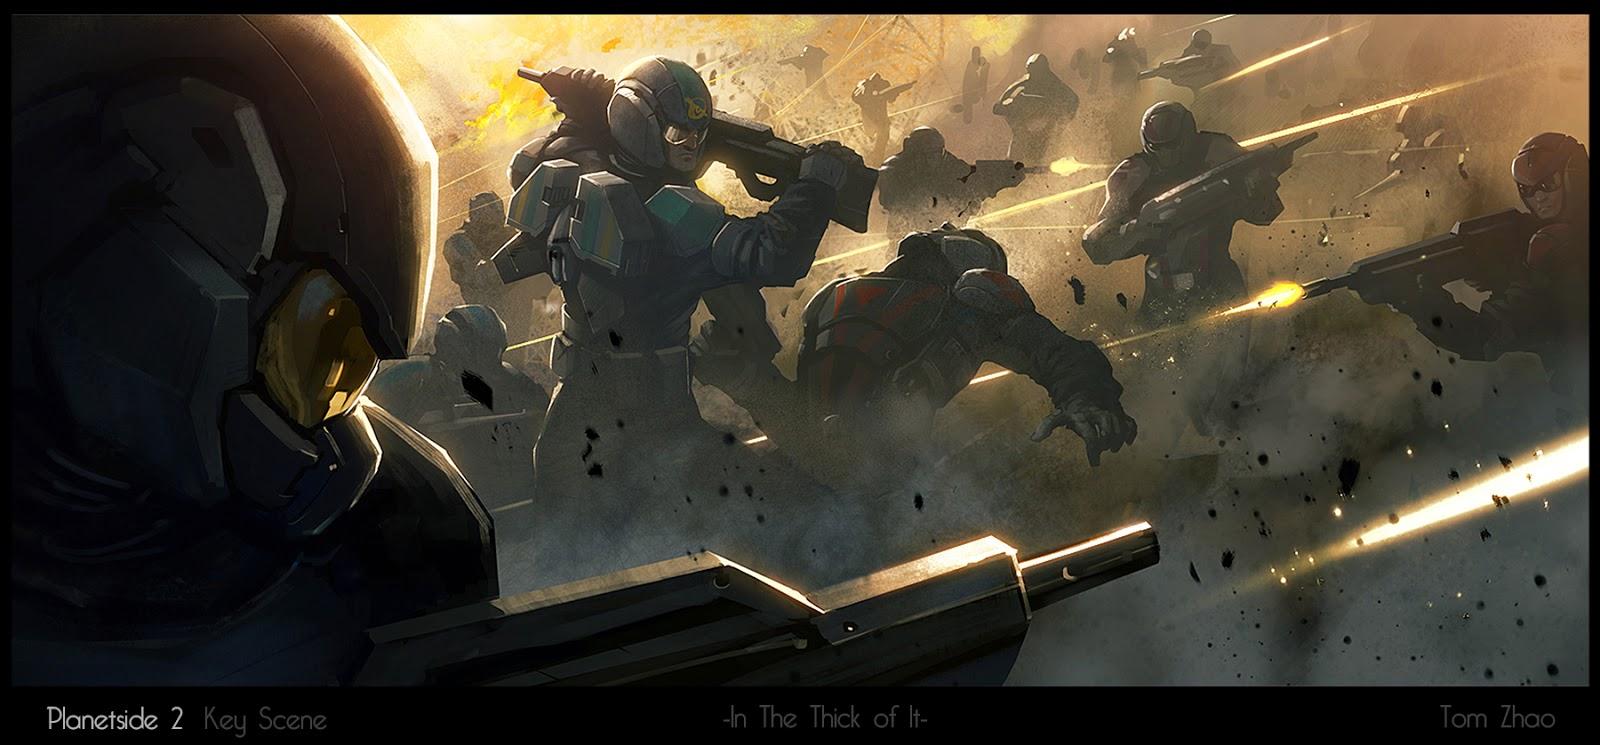 http://3.bp.blogspot.com/-wF41GDLhnFk/UQt3525fCVI/AAAAAAAABnQ/Hzi7TsvheLs/s1600/PS2-2%2Bcopy.jpg